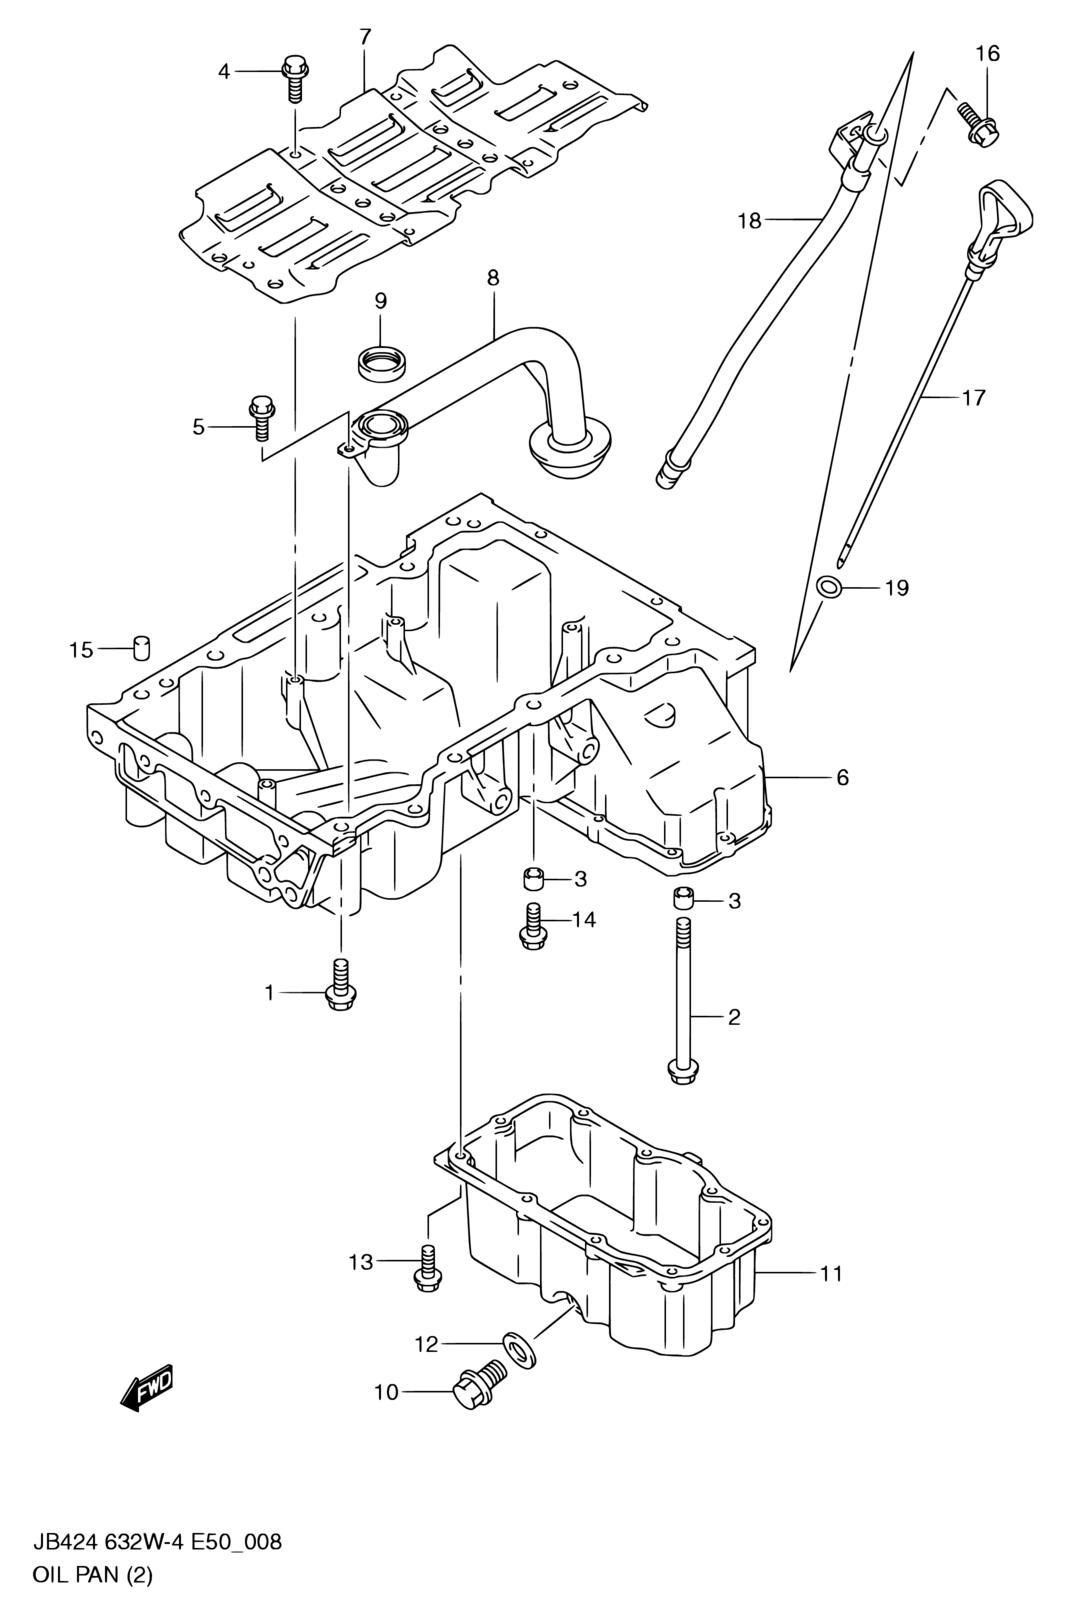 E50 Engine Diagram Free Wiring For You Puch Maxi Luxe Library Rh 67 Akszer Eu Schutzenpanzerwagen